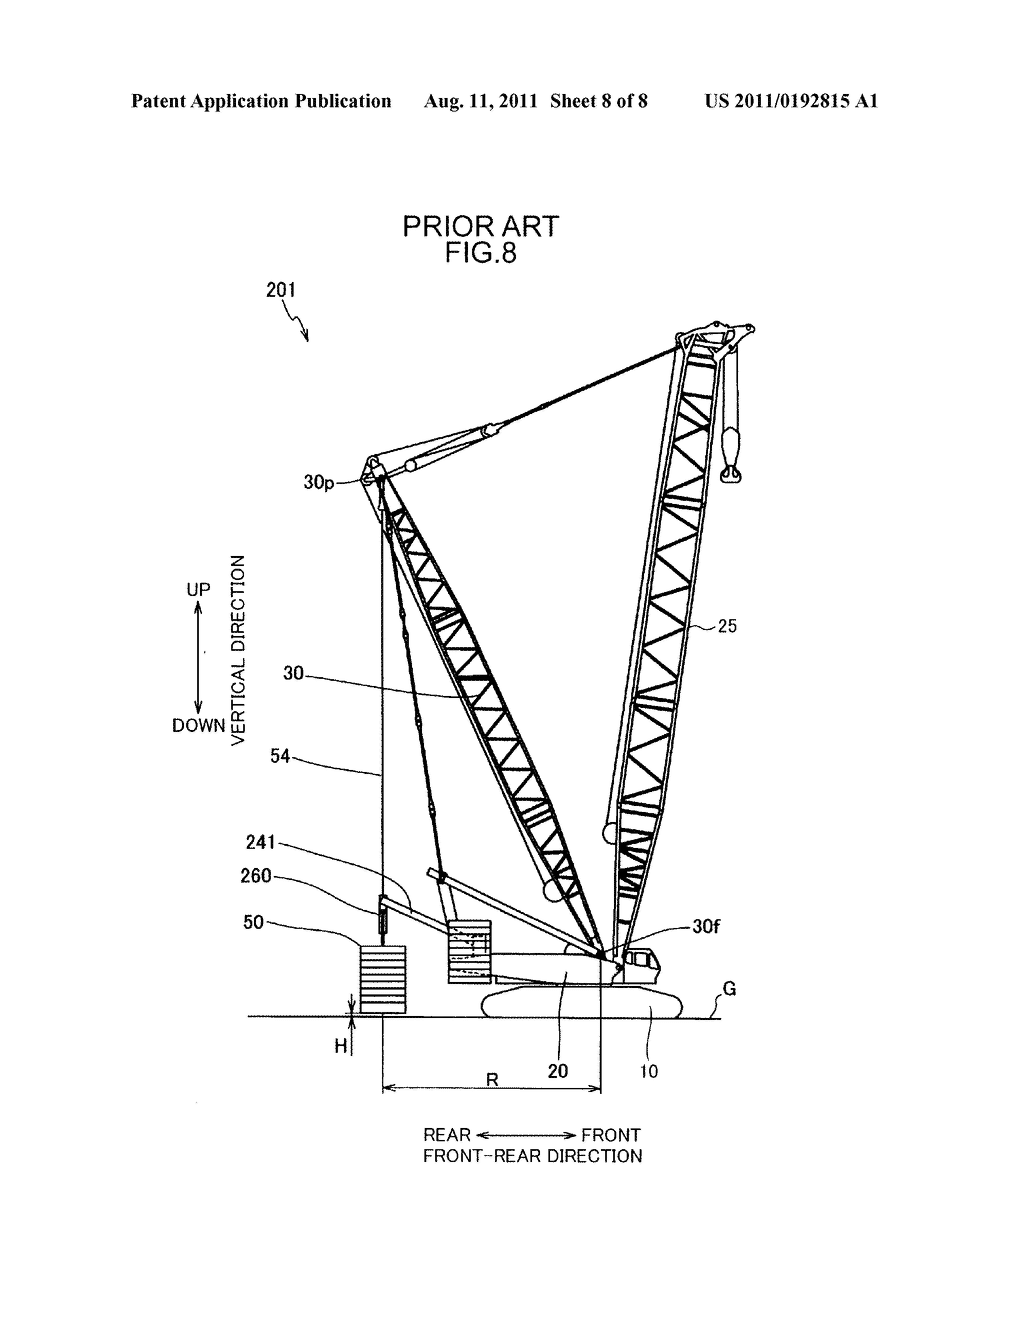 mobile crane having counterweight diagram schematic and image 09 rh patentsencyclopedia com crane chemical crane schematic minecraft